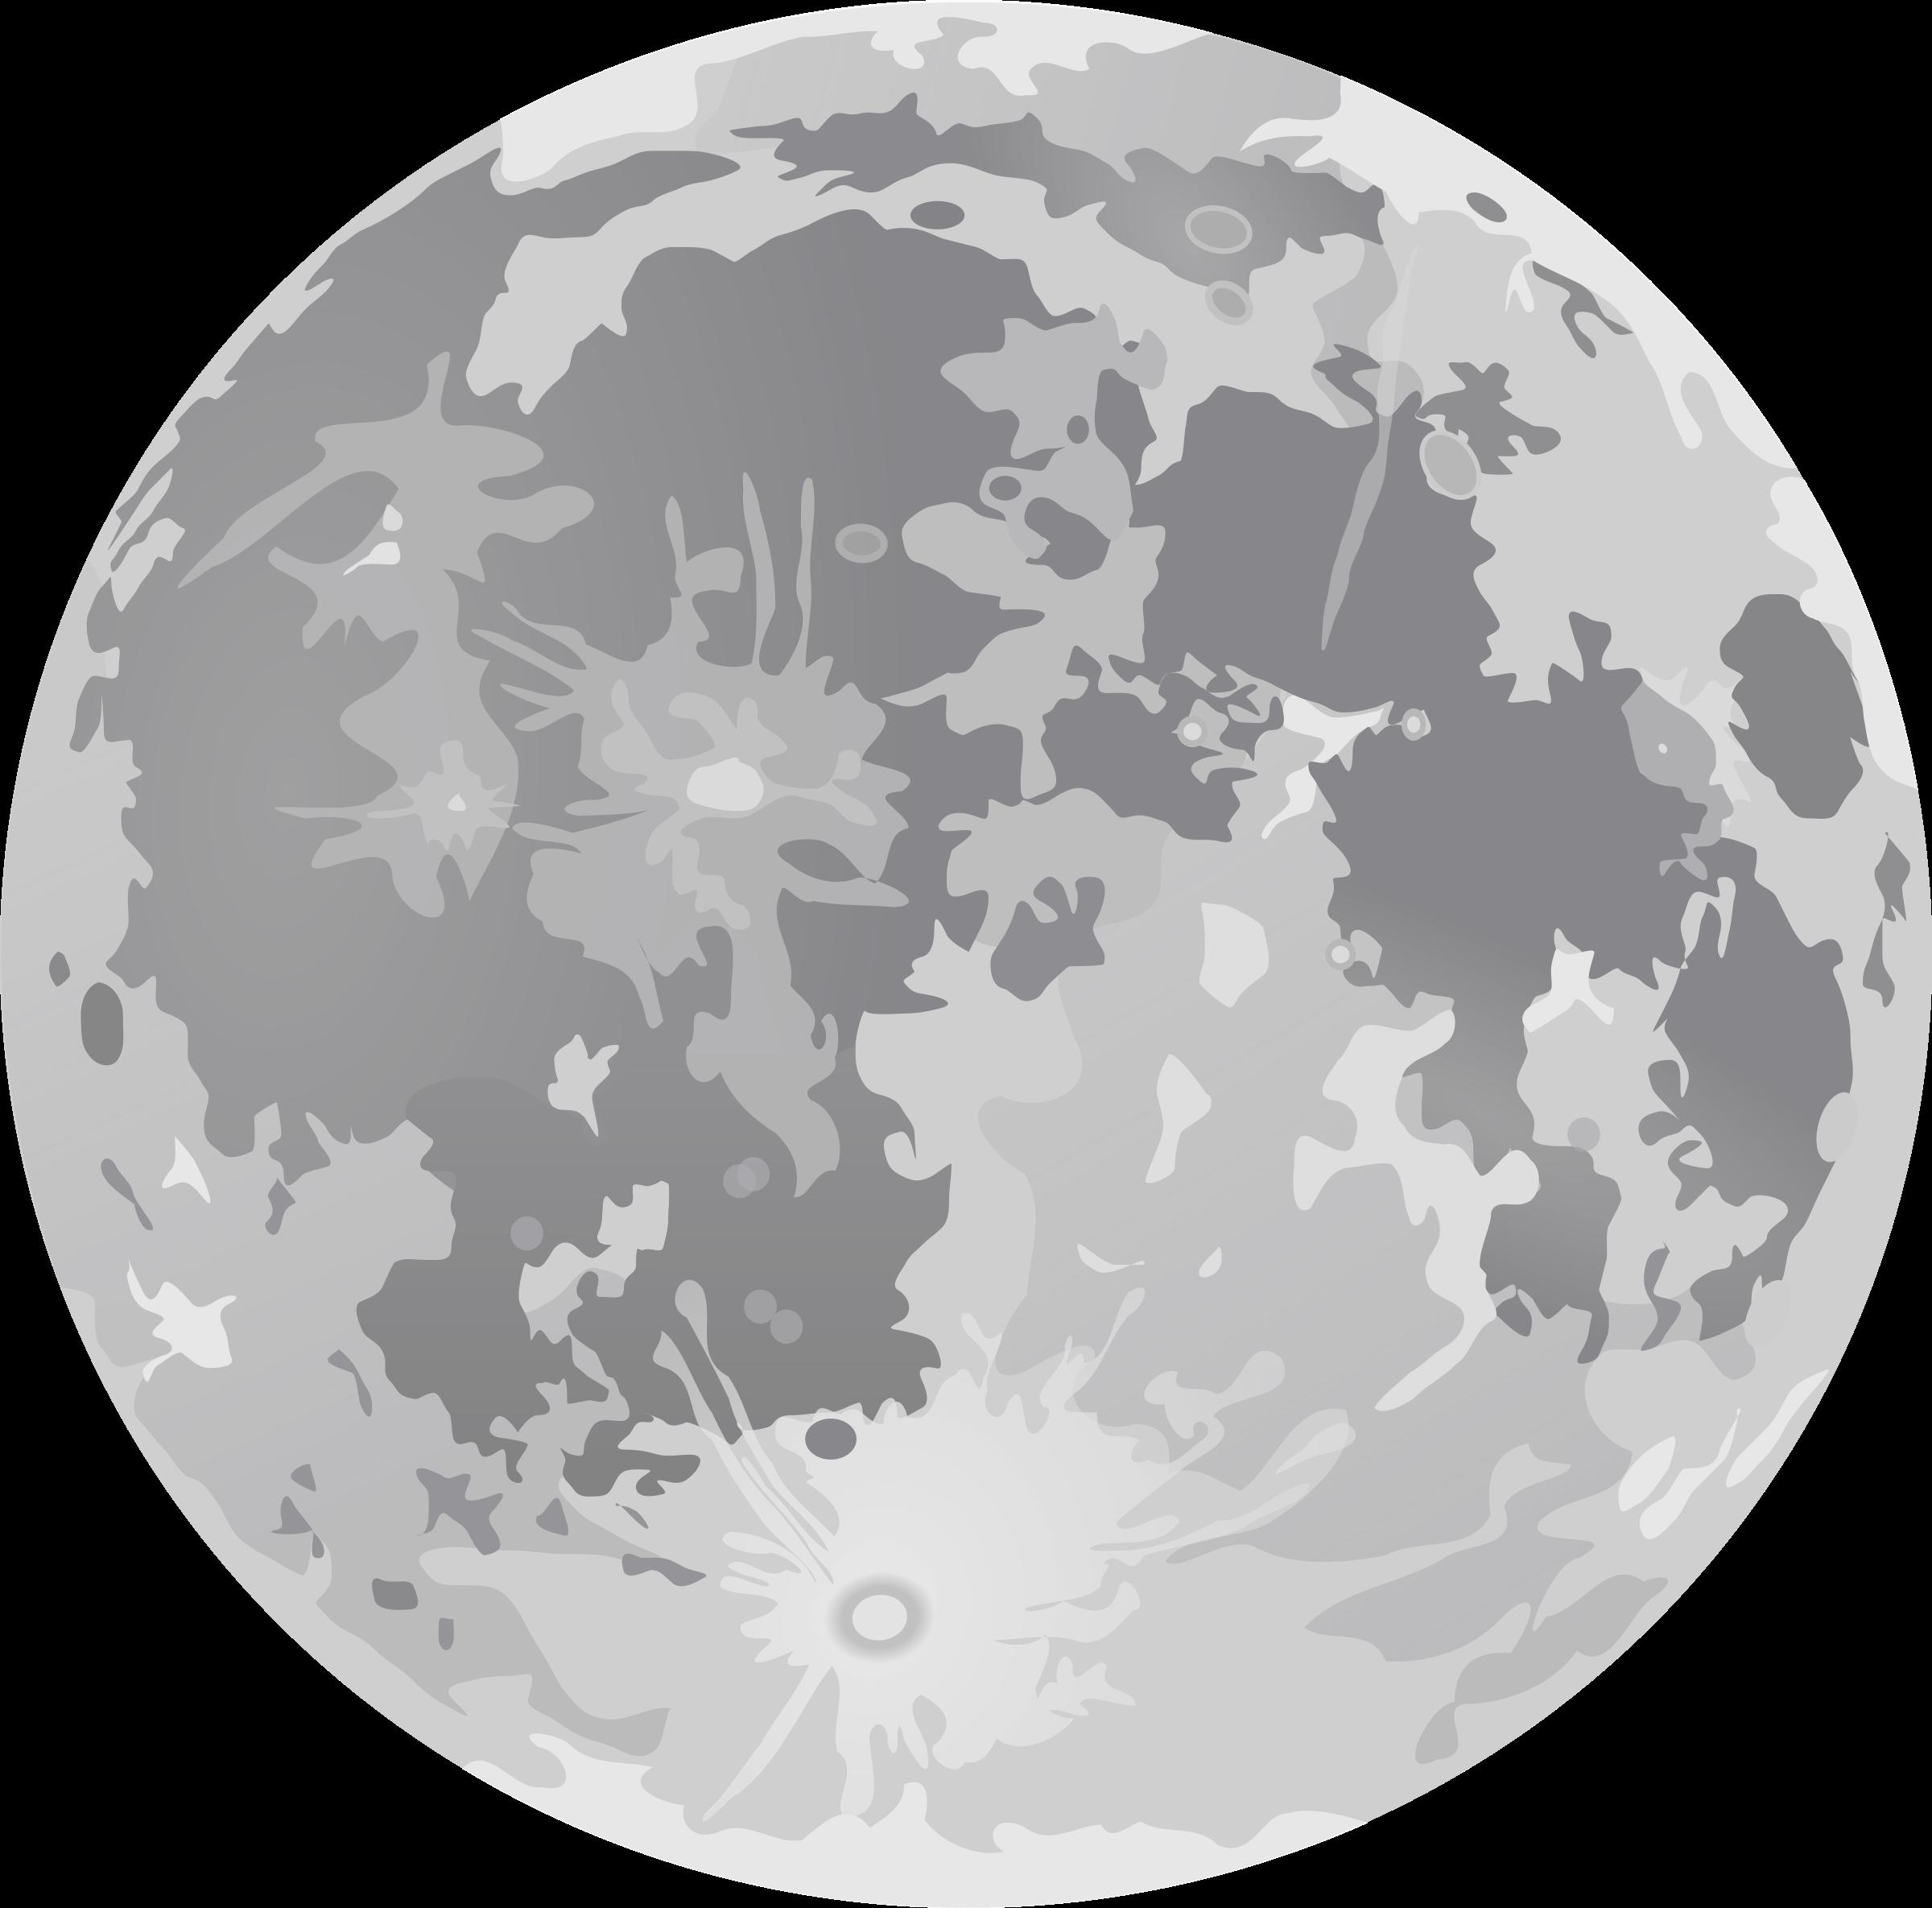 Clipart moon pdf. Full dan gerhards big